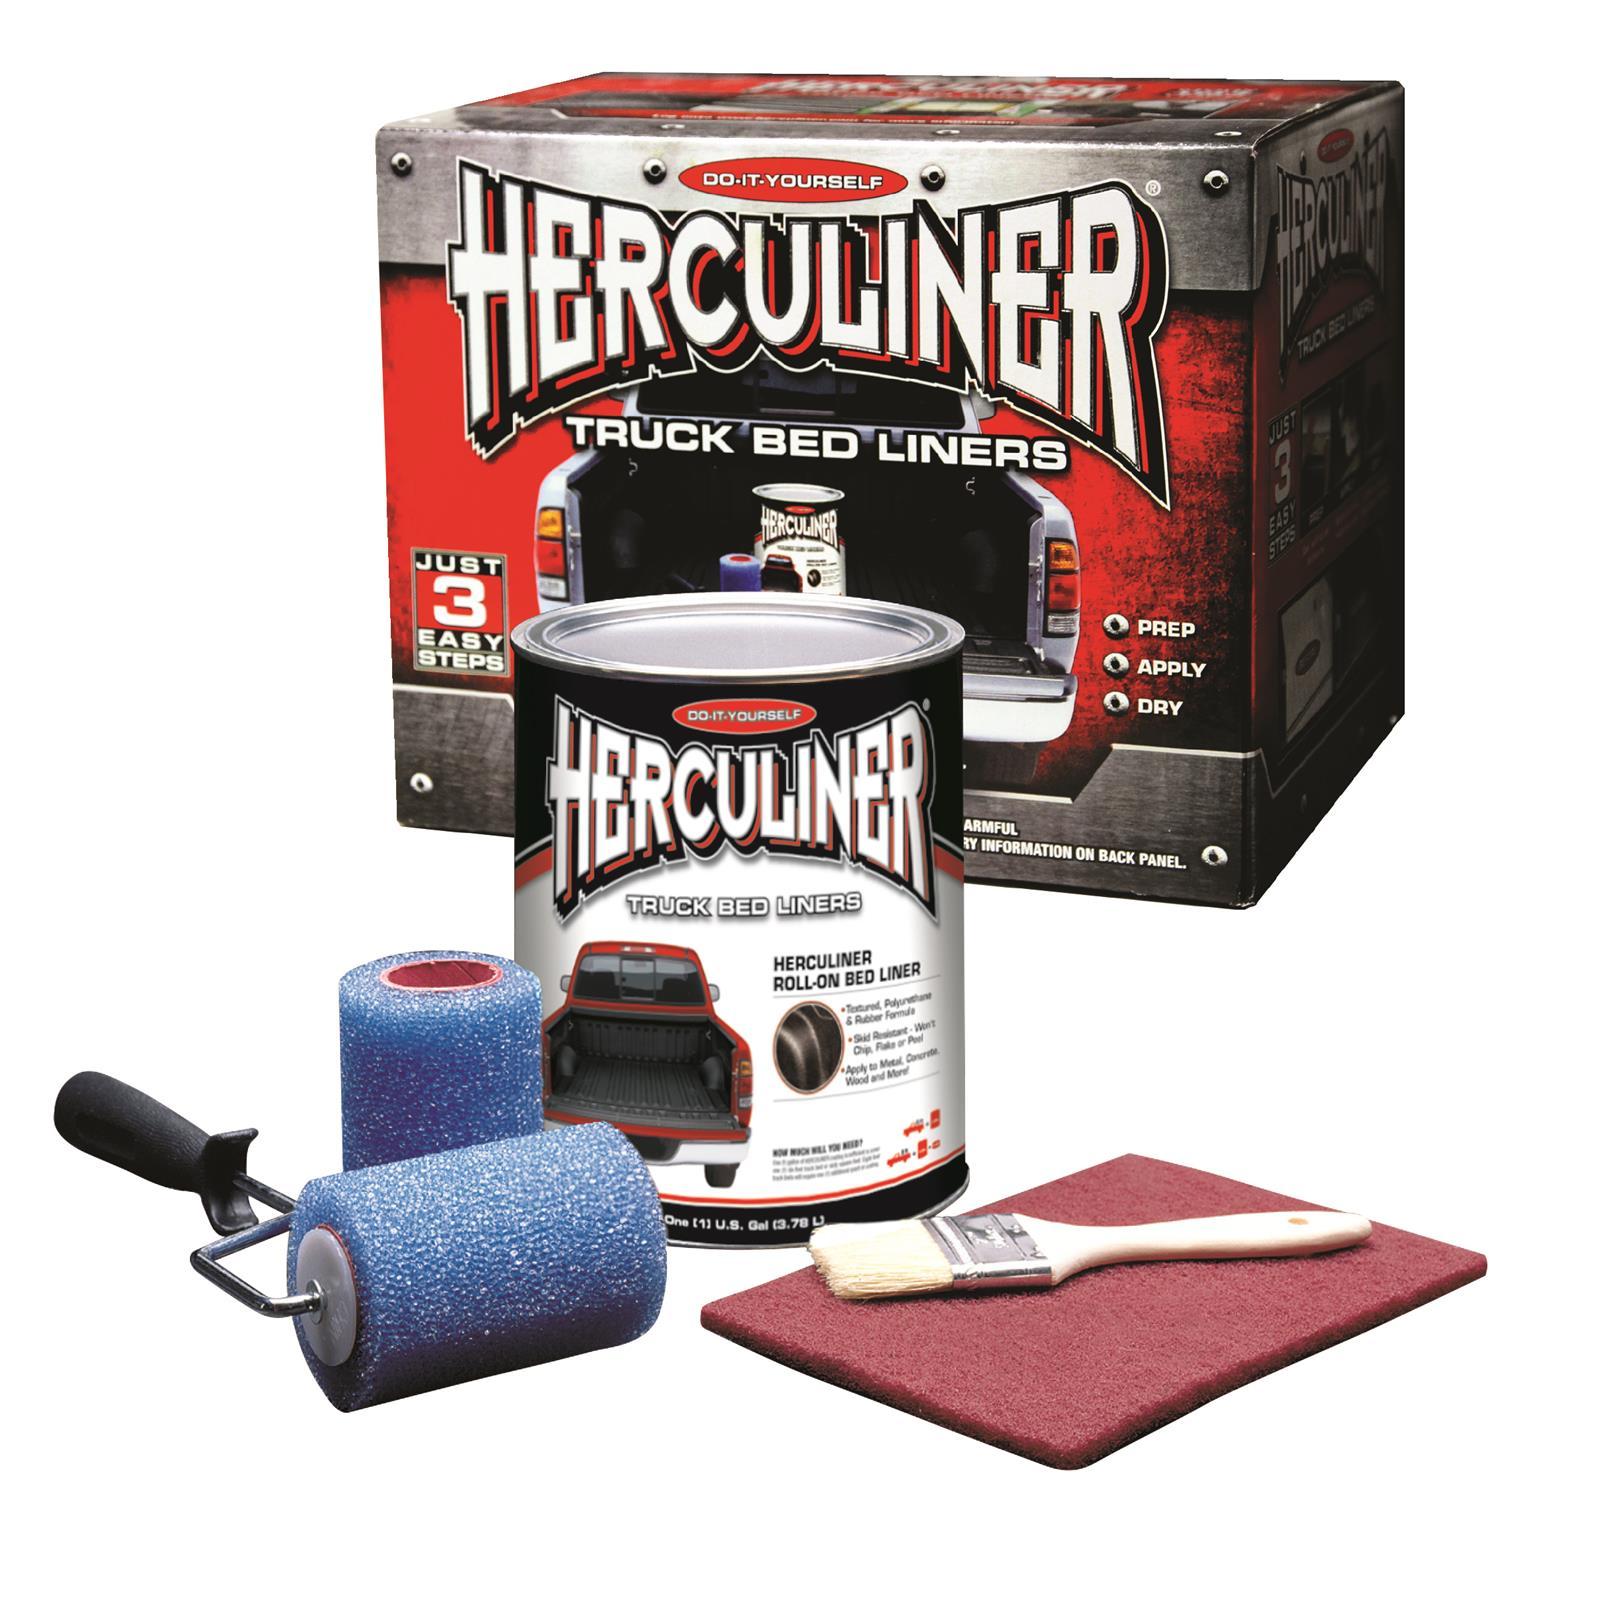 Herculiner brush on bedliner kits hcl1g8 free shipping on orders herculiner brush on bedliner kits hcl1g8 free shipping on orders over 99 at summit racing nvjuhfo Images